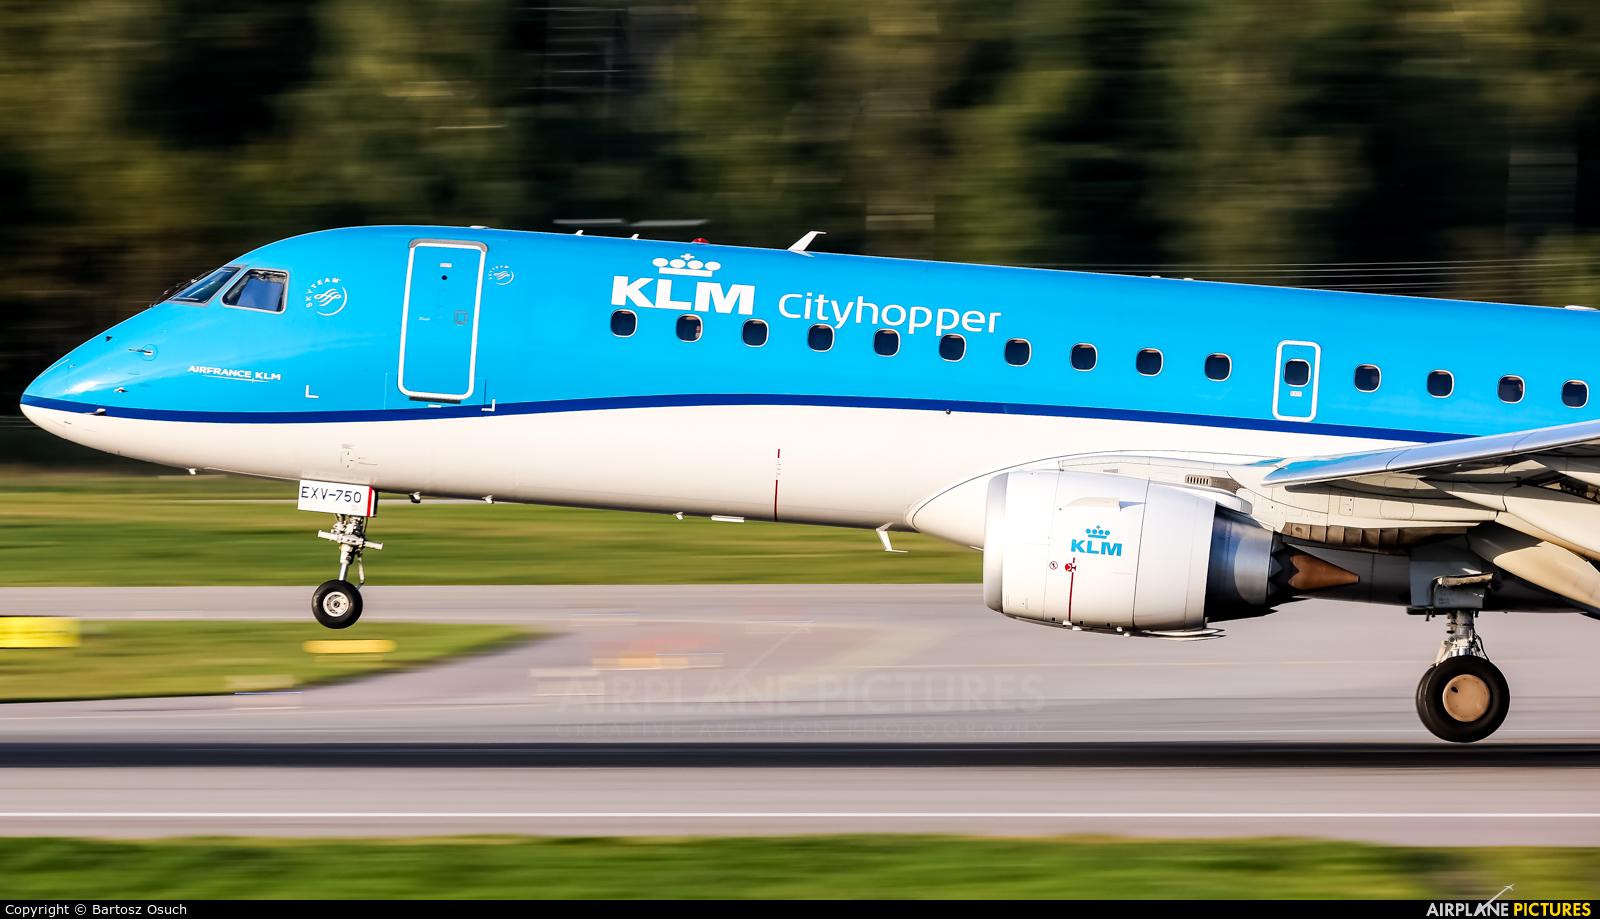 KLM Cityhopper PH-EXV aircraft at Gdańsk - Lech Wałęsa